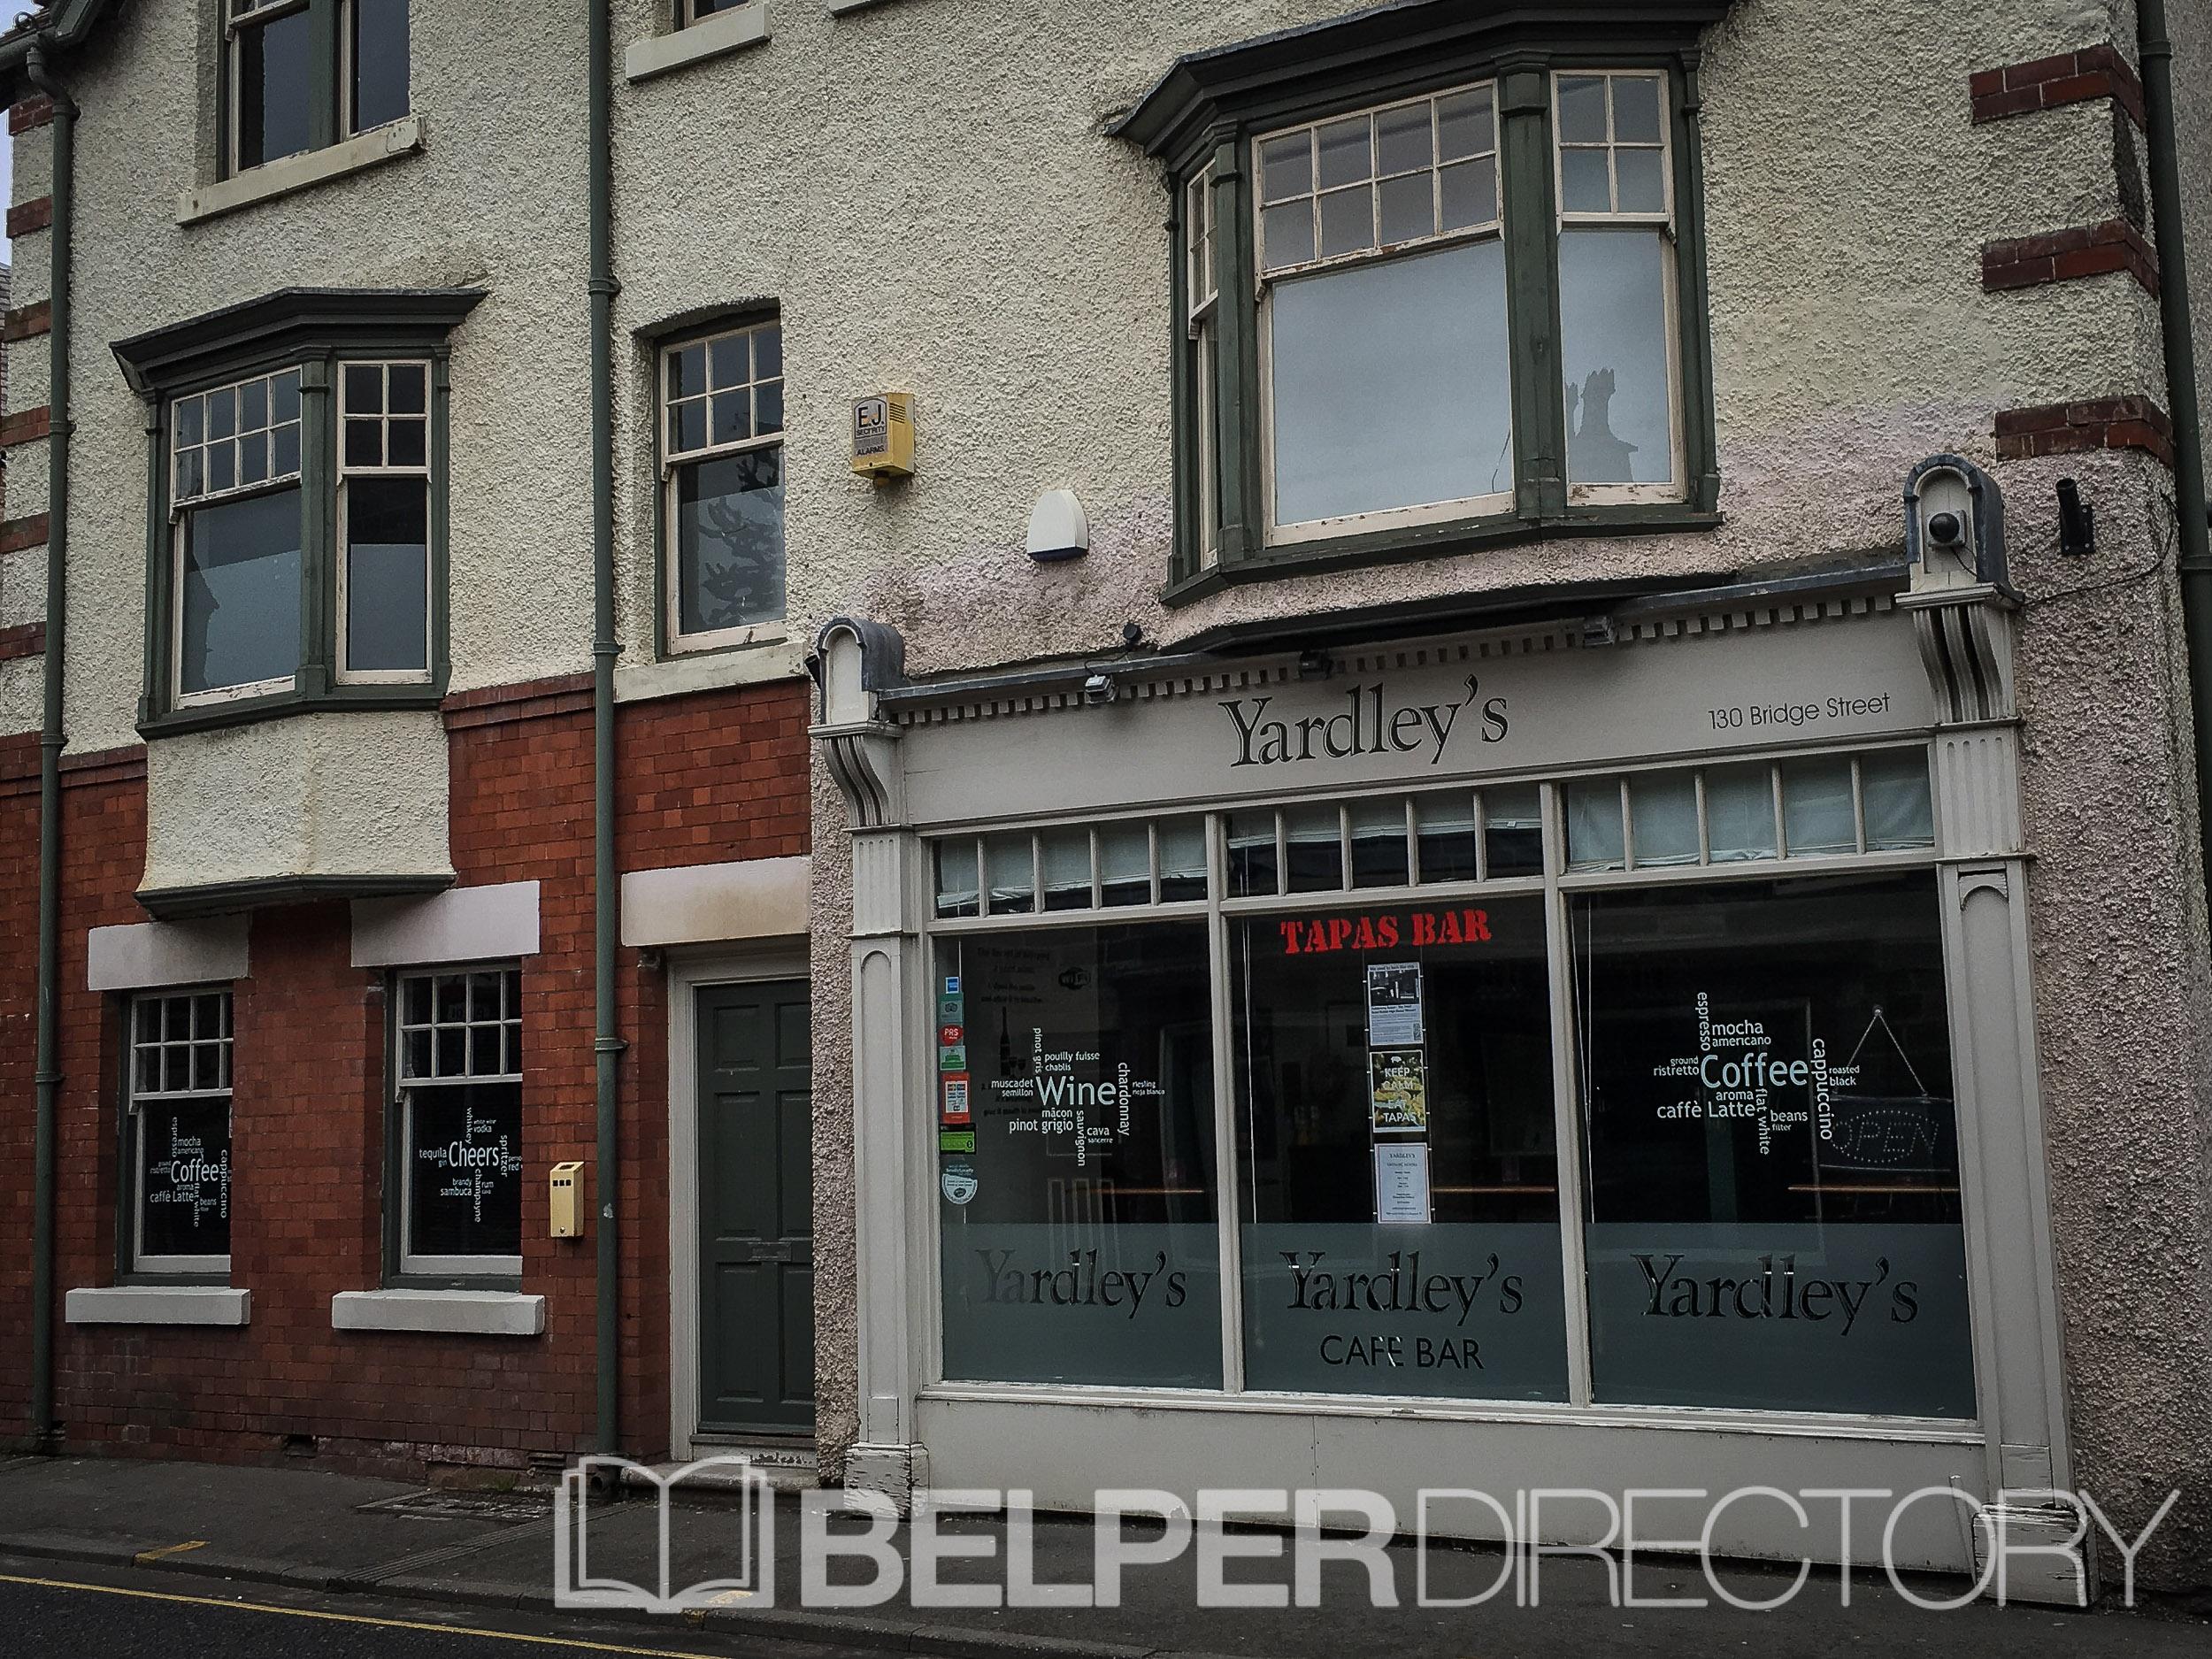 Belper Directory- Yardleys Bar.jpg